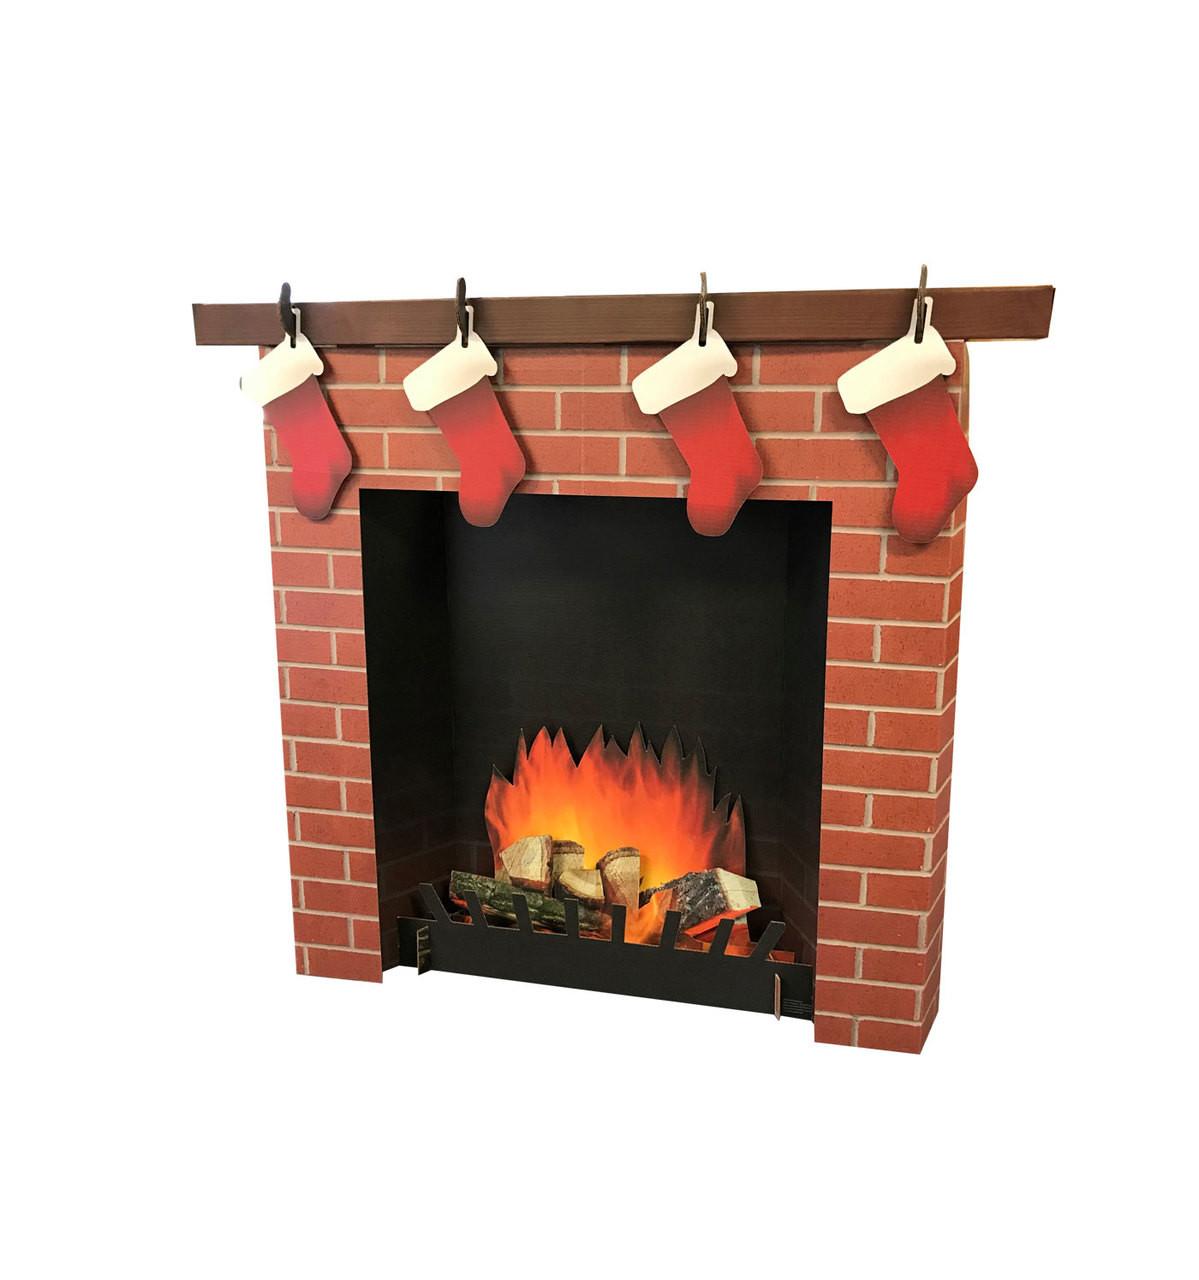 3D Brick Fireplace Life-Size Cardboard Cutout | Chirstmas Decor 1